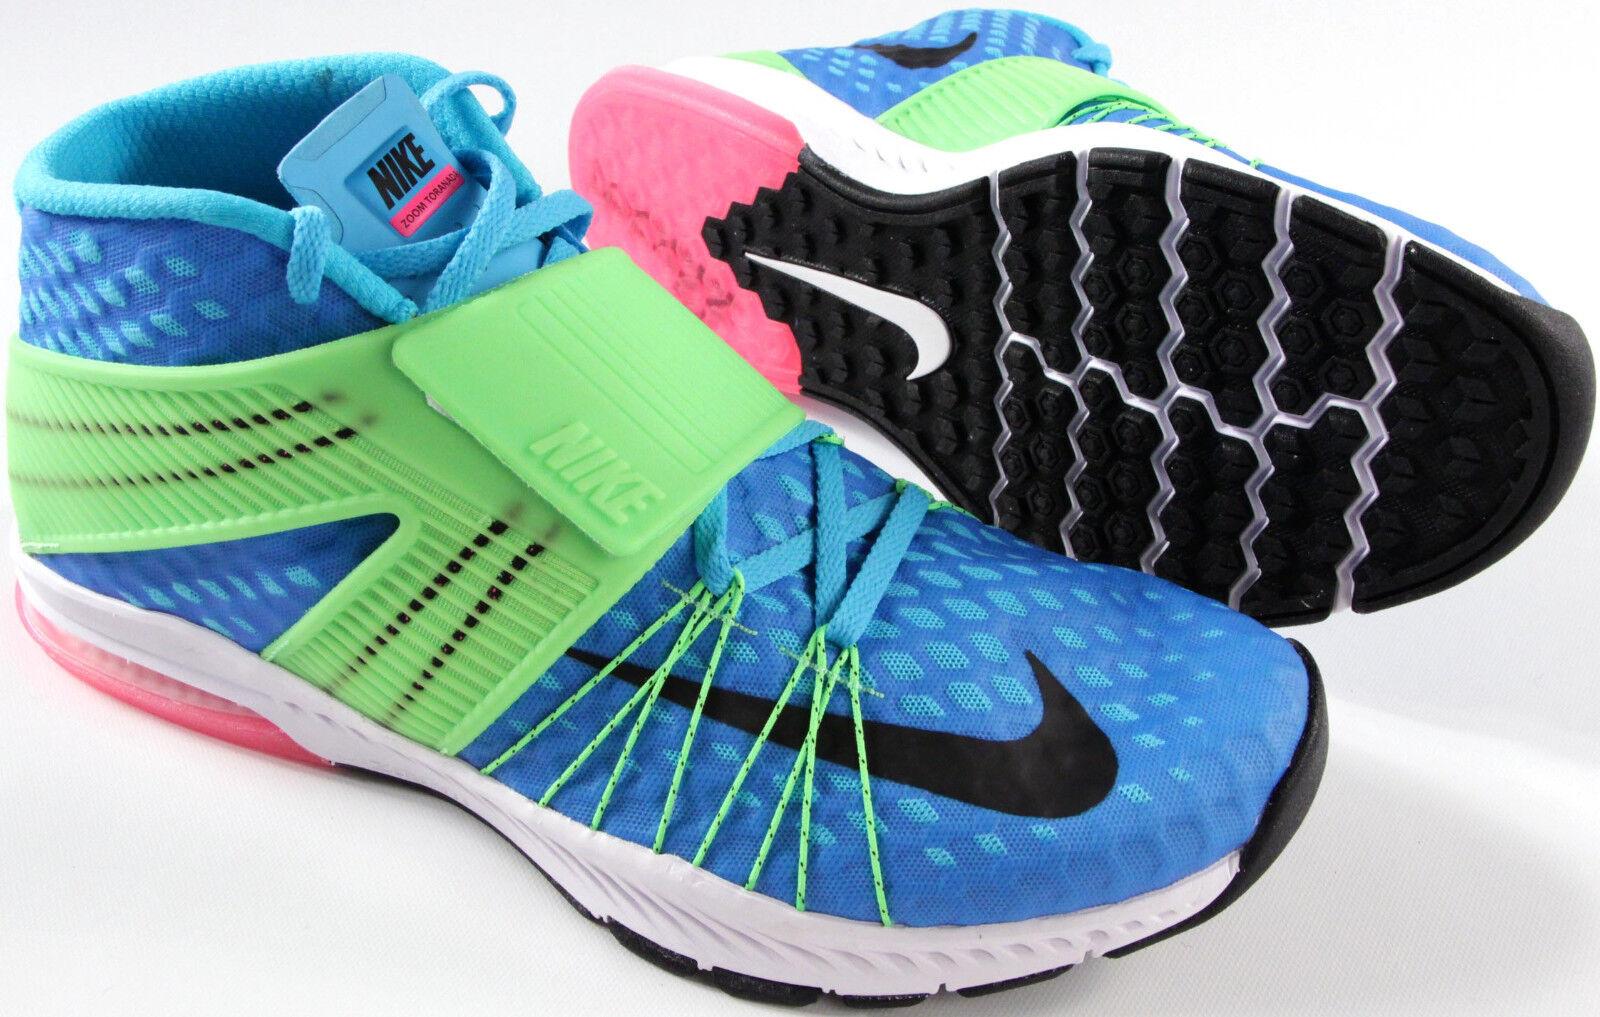 NIKE Zoom Air Train Toranada shoes-NEW-bluee green mesh running gym sneakers- 140